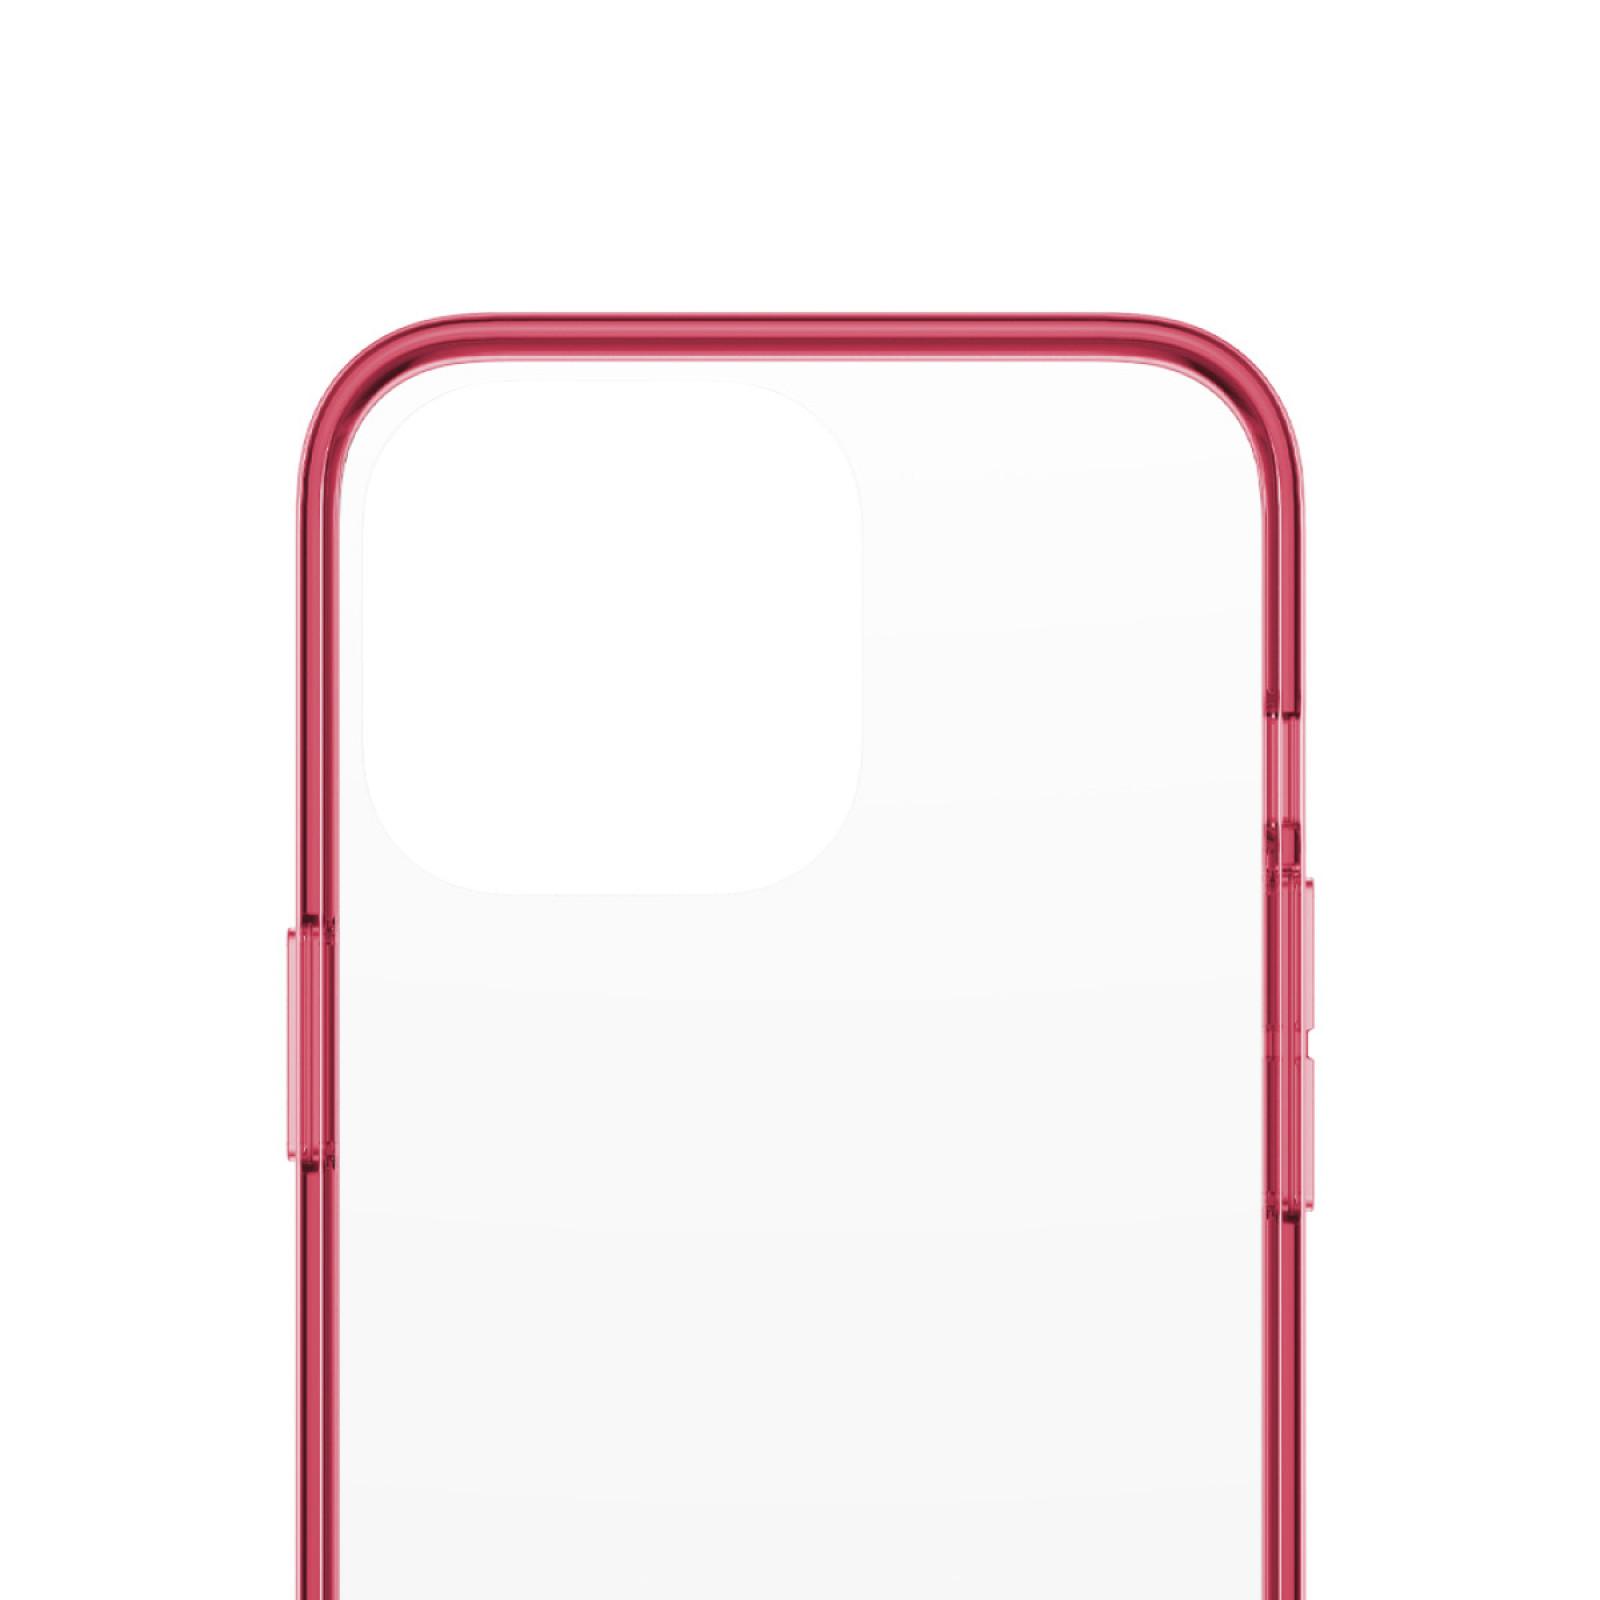 Гръб PanzerGlass за IPhone 13 Pro, ClearCase - Червена рамка